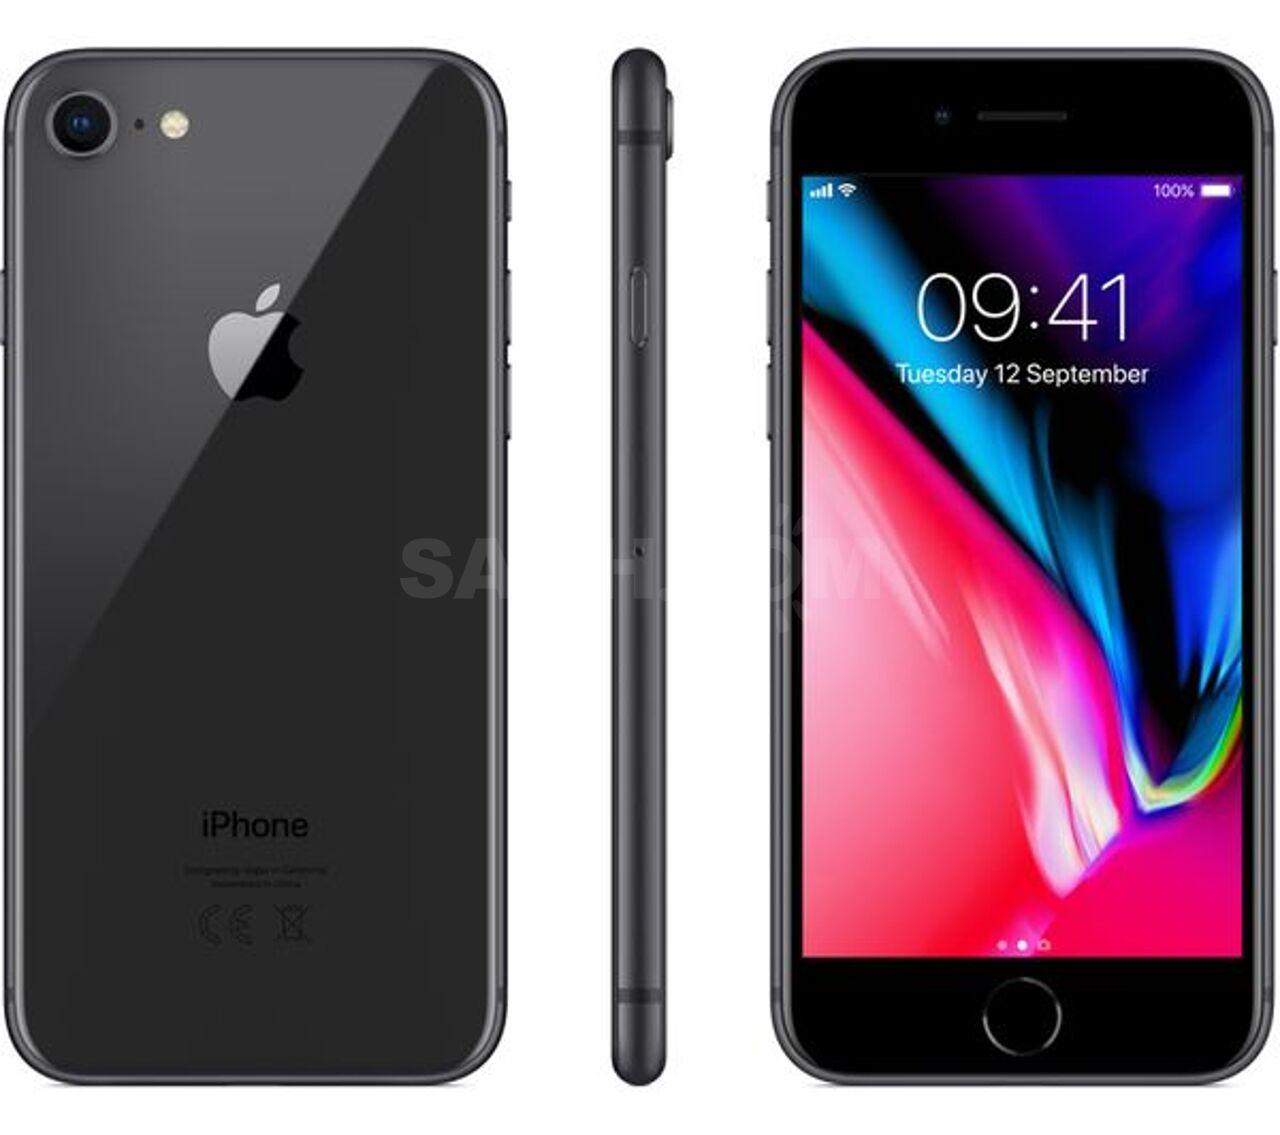 Продам новые оригинальные Apple Iphone 8 256Gb Space Gray на гарантии (Южно- Сахалинск) 18aa204e875